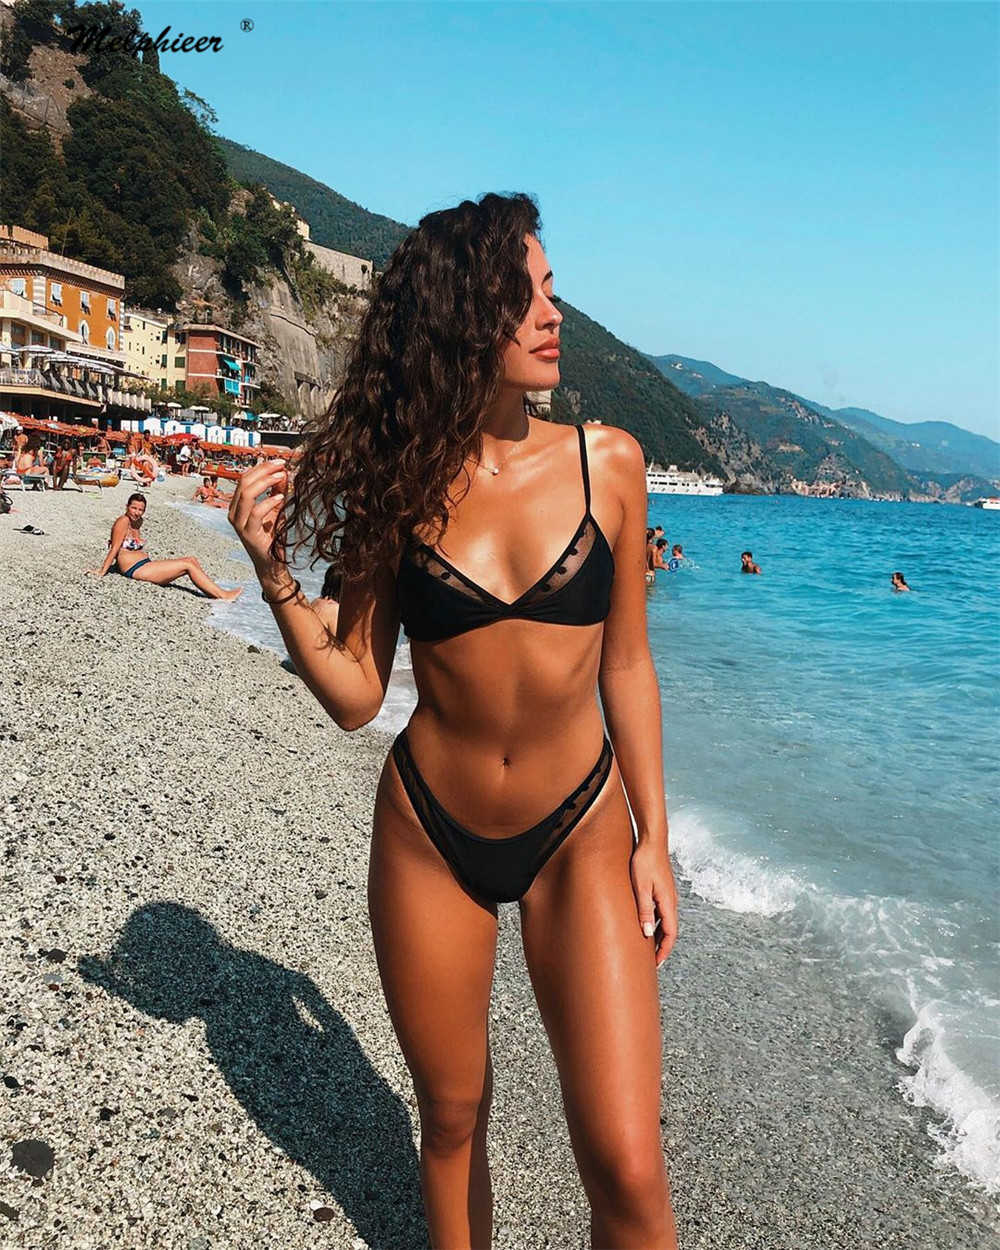 Melphieer New Black Bikini Sets Mesh Brazilian Swimwear Girls Sexy Australian Biquini Swimsuit Bathing Suits Maillot Beach 2020